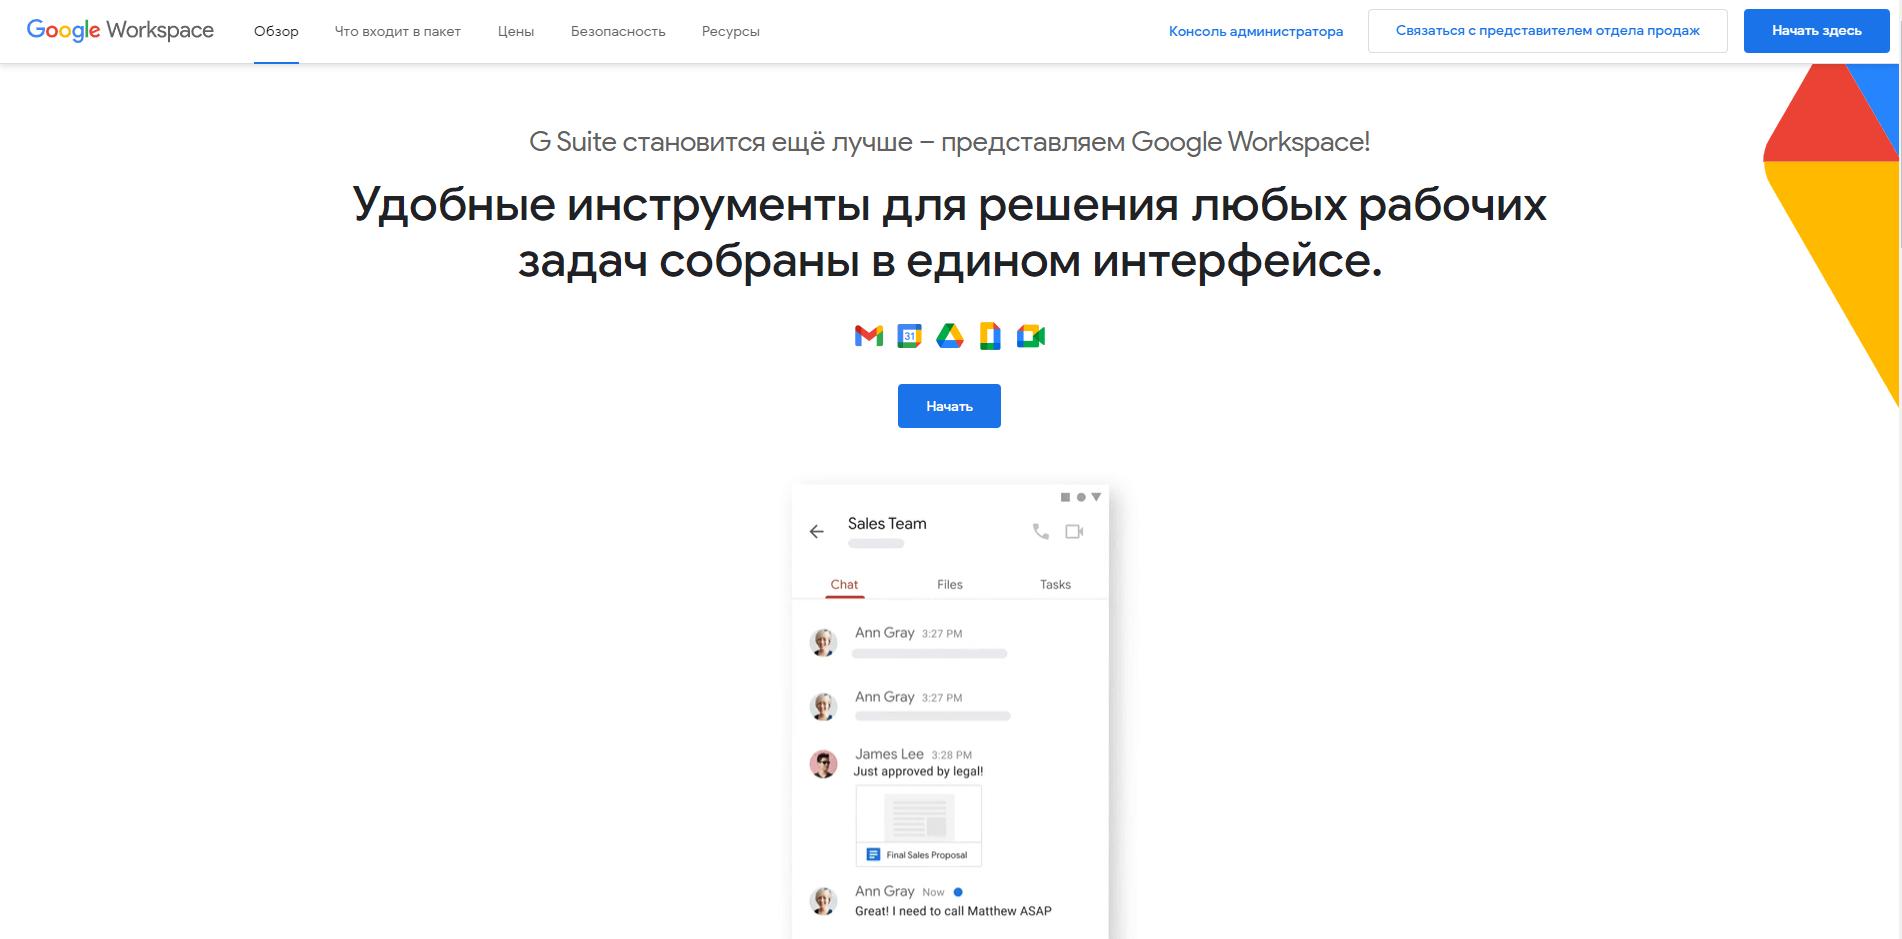 Почта на своем домене. Главная страница сервиса Google Workspace.